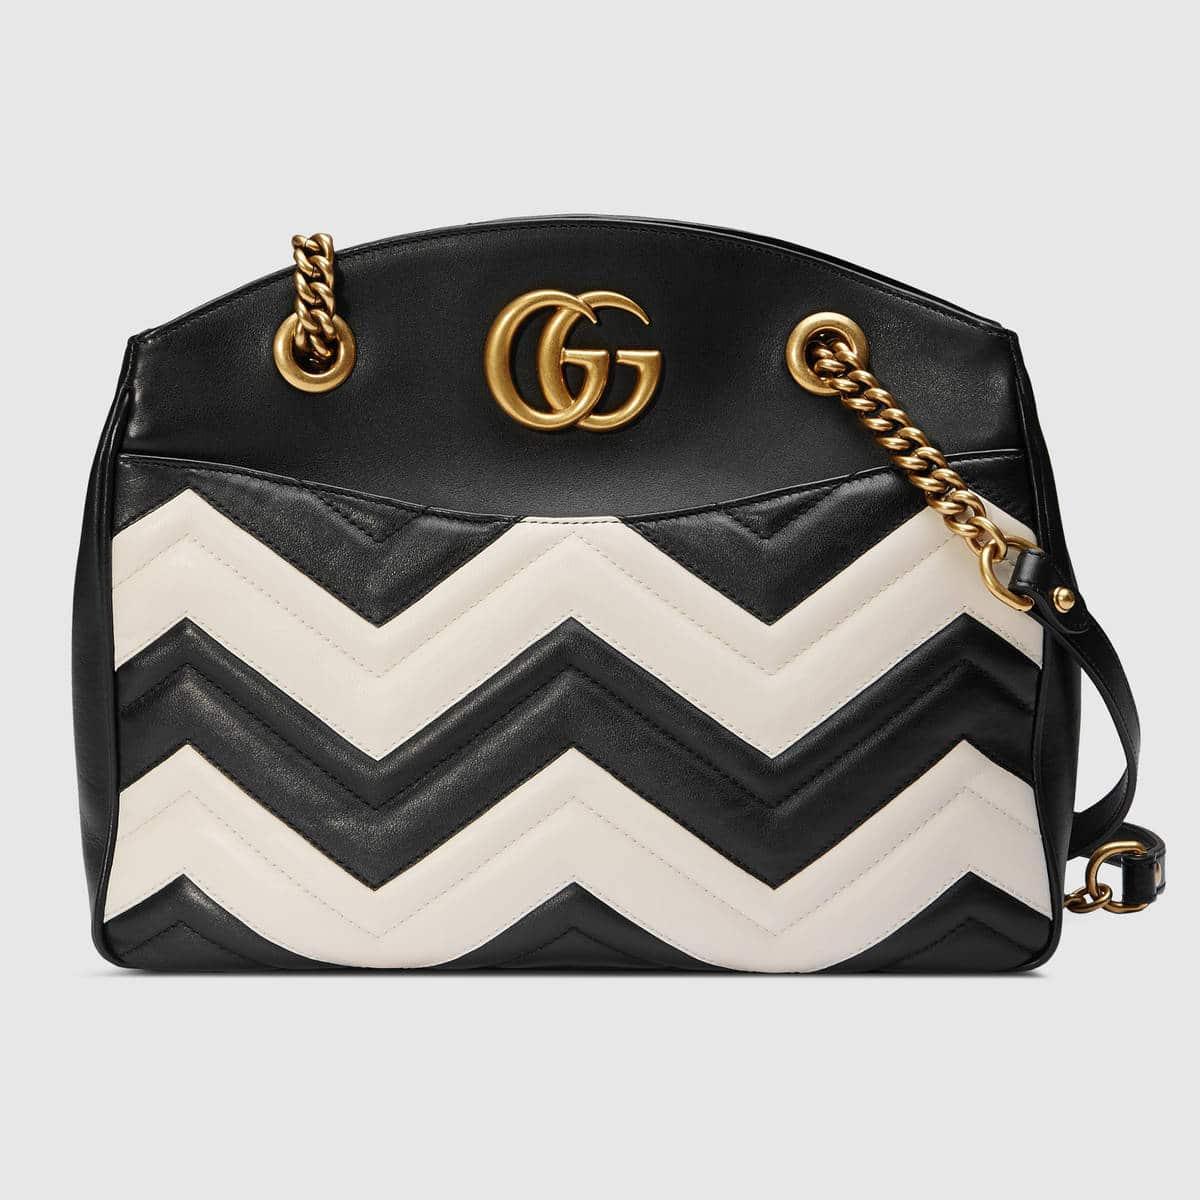 d7c684d62642 Gucci Black White Matelasse GG Marmont Medium Tote Bag